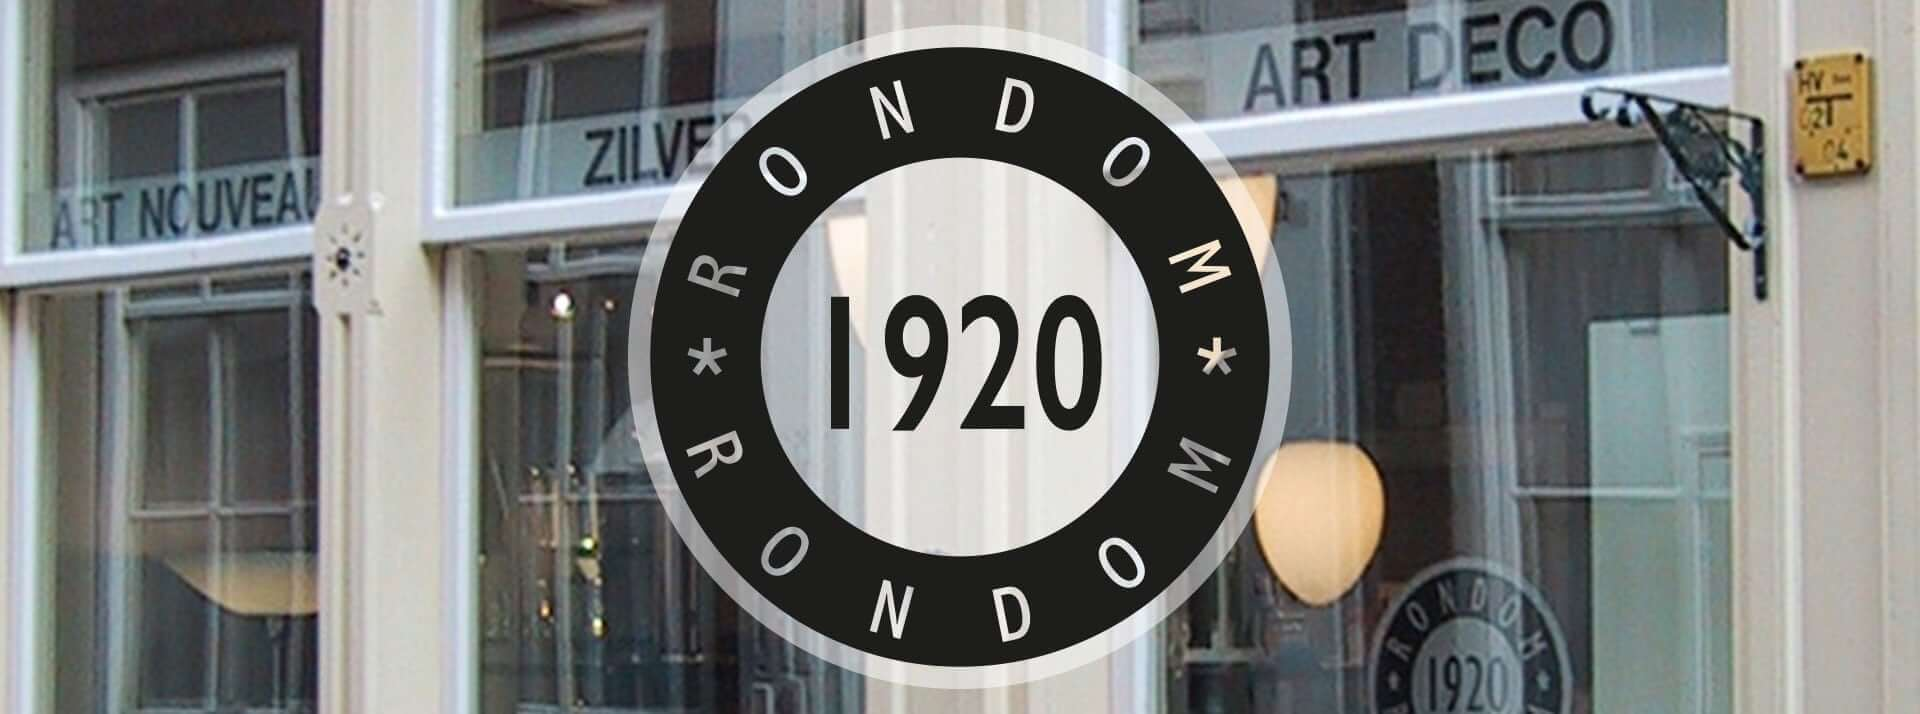 Rondom 1920 – Art Deco & Art Nouveau Zilver & Antiek